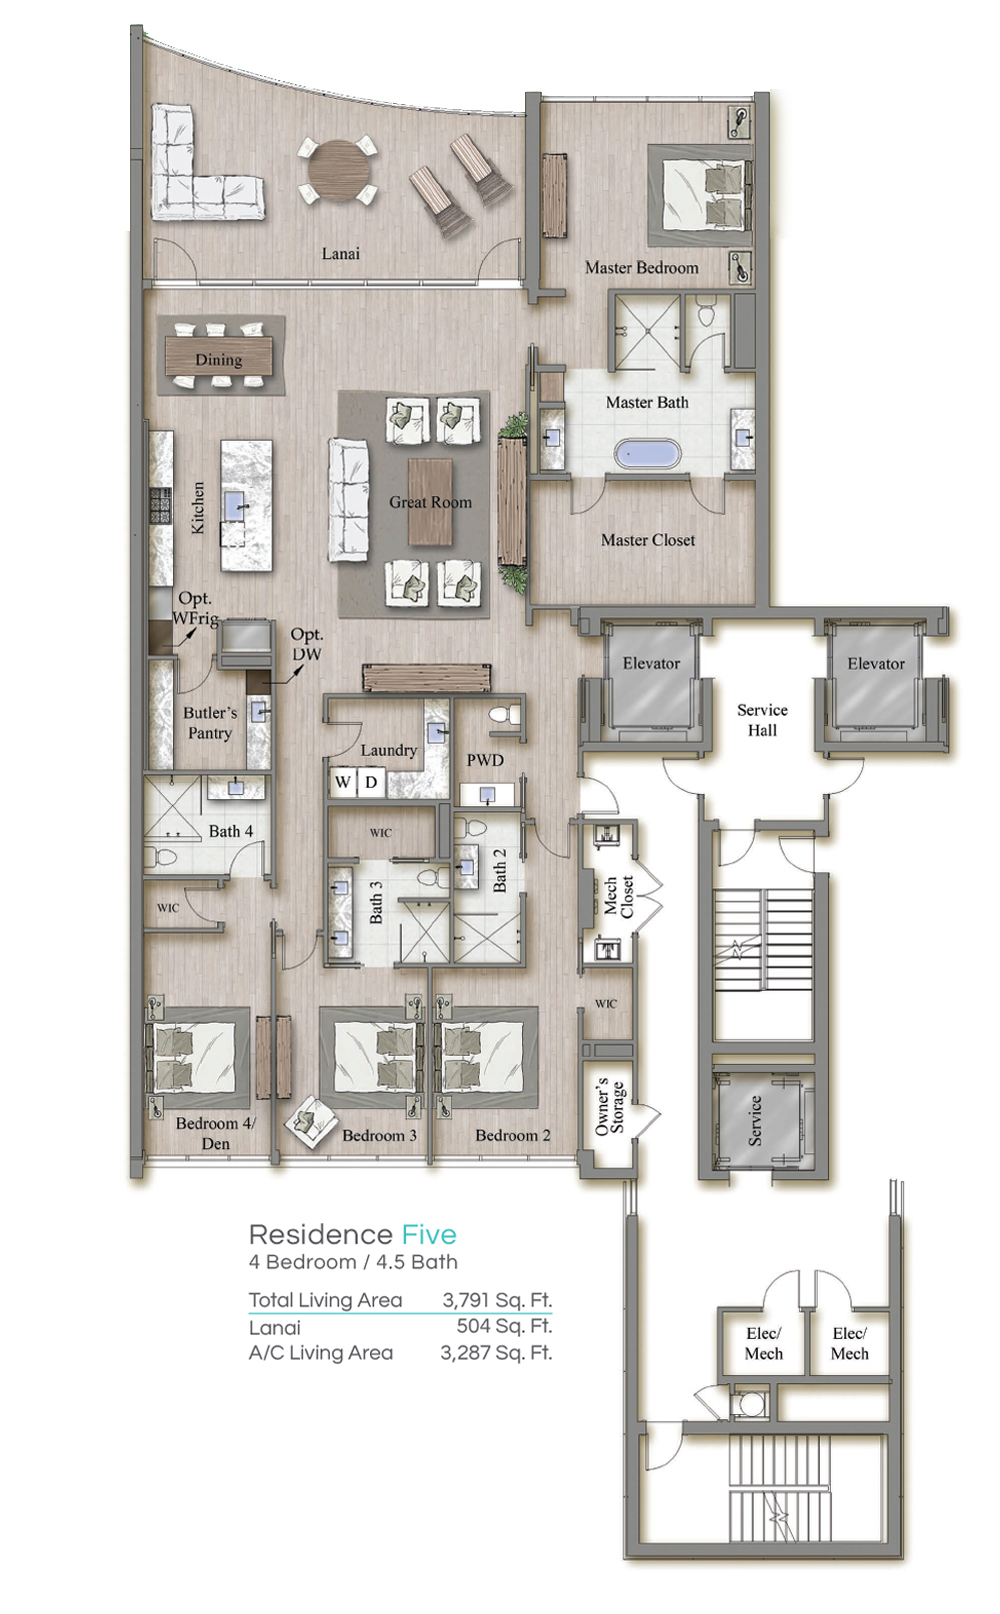 Tower 2 Residence 5 Floorplan